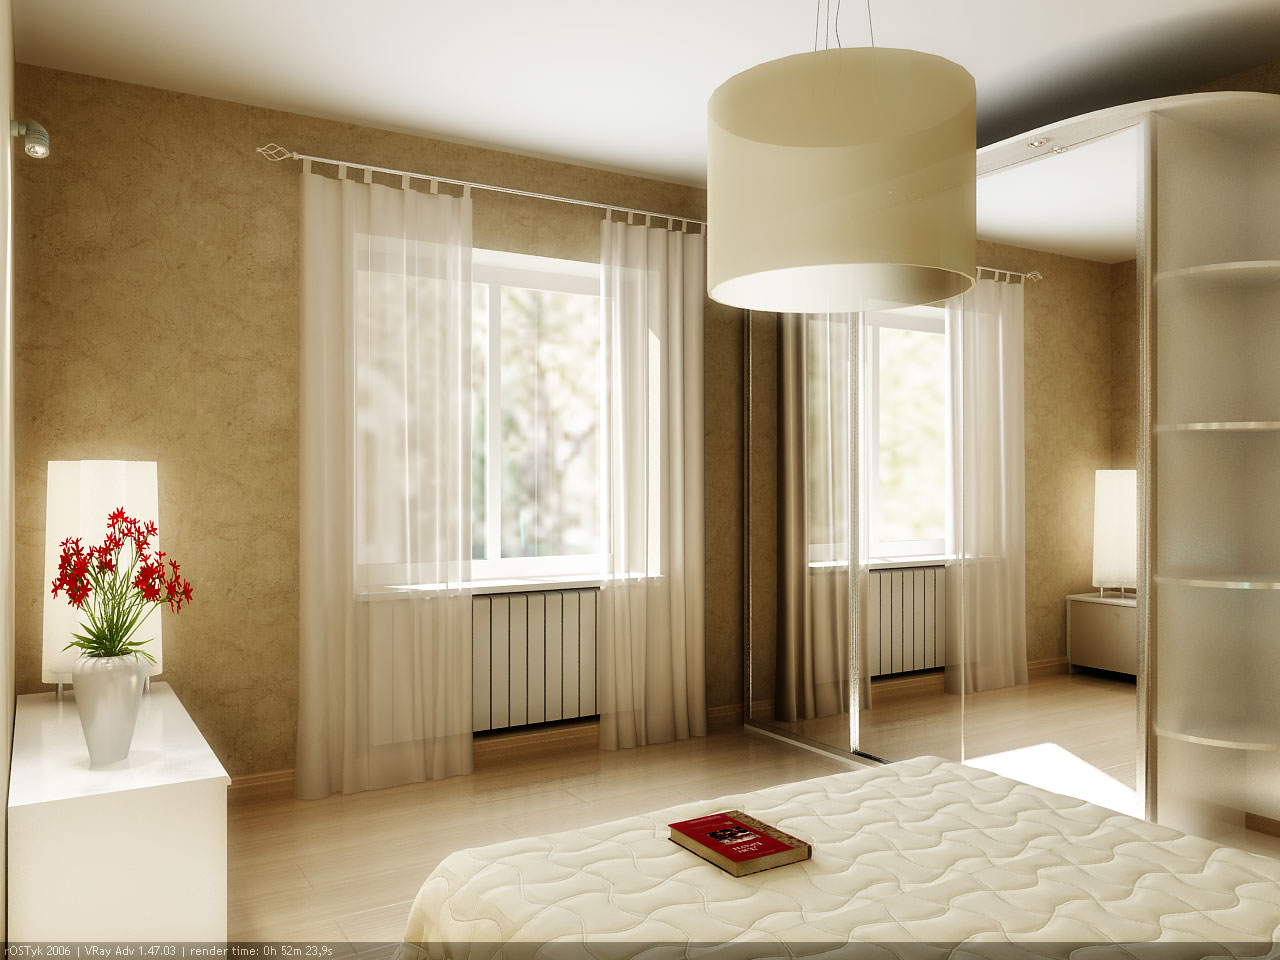 Extra Interior Design Wallpapers 1280x960